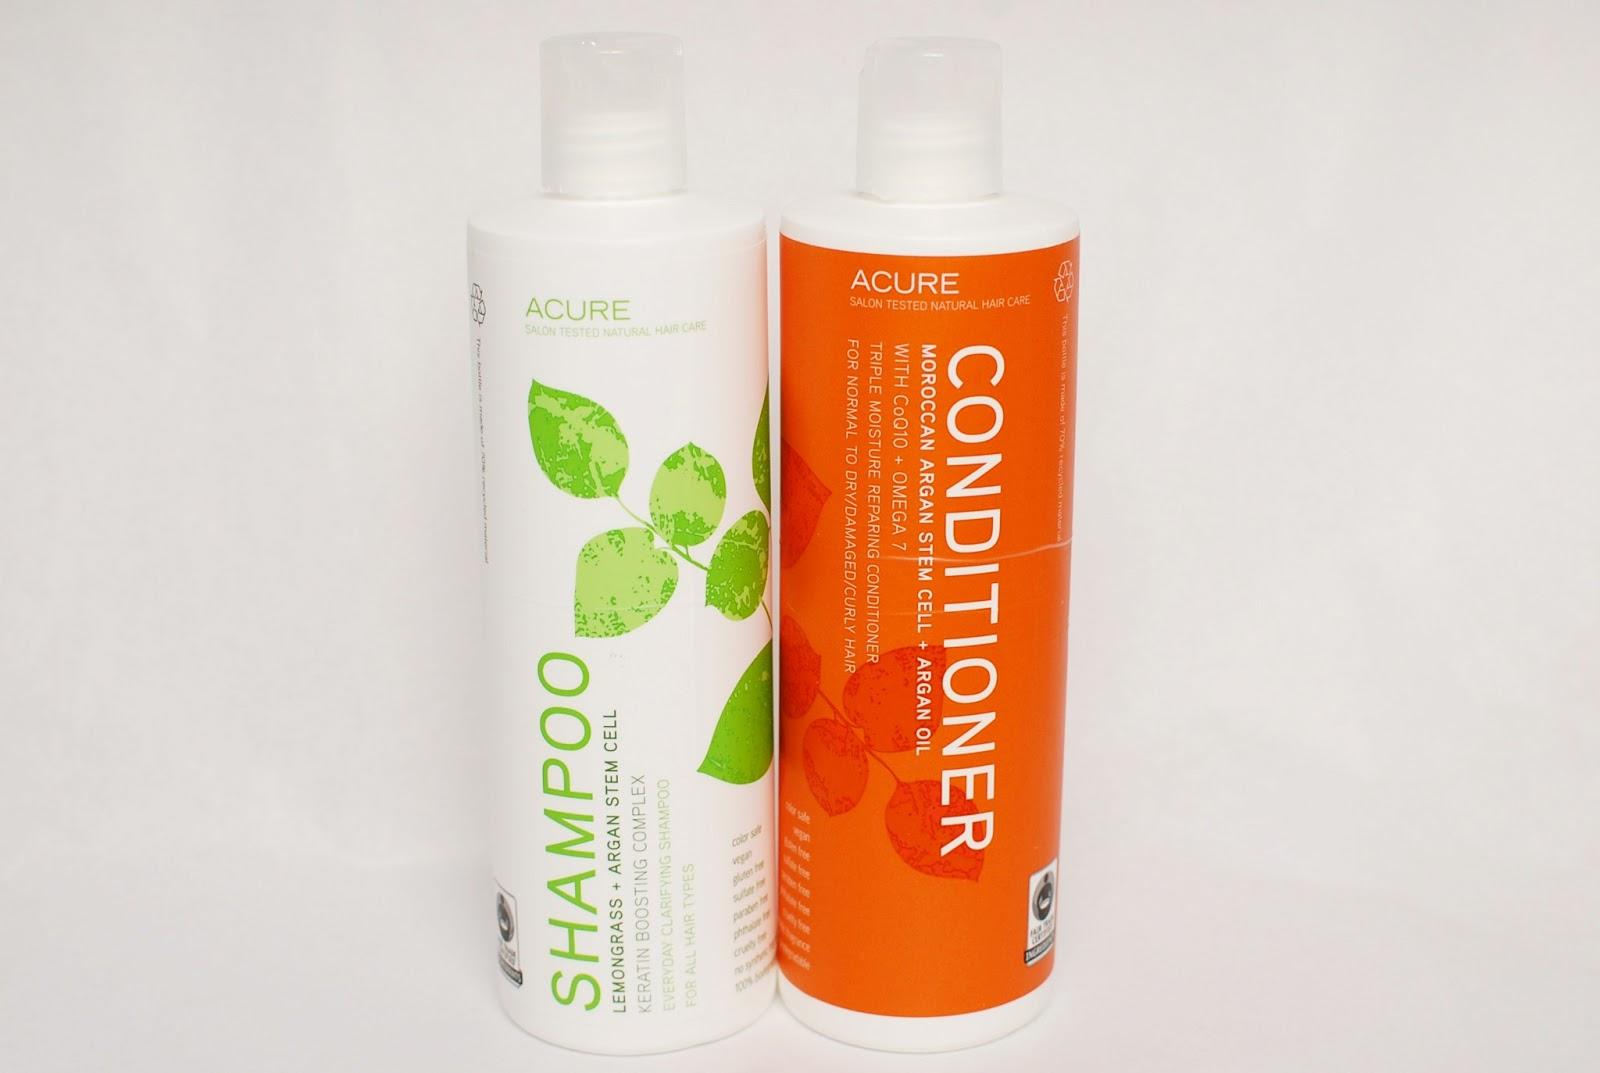 Acure Shampoo Lemongrass, Conditioner Argan Oil